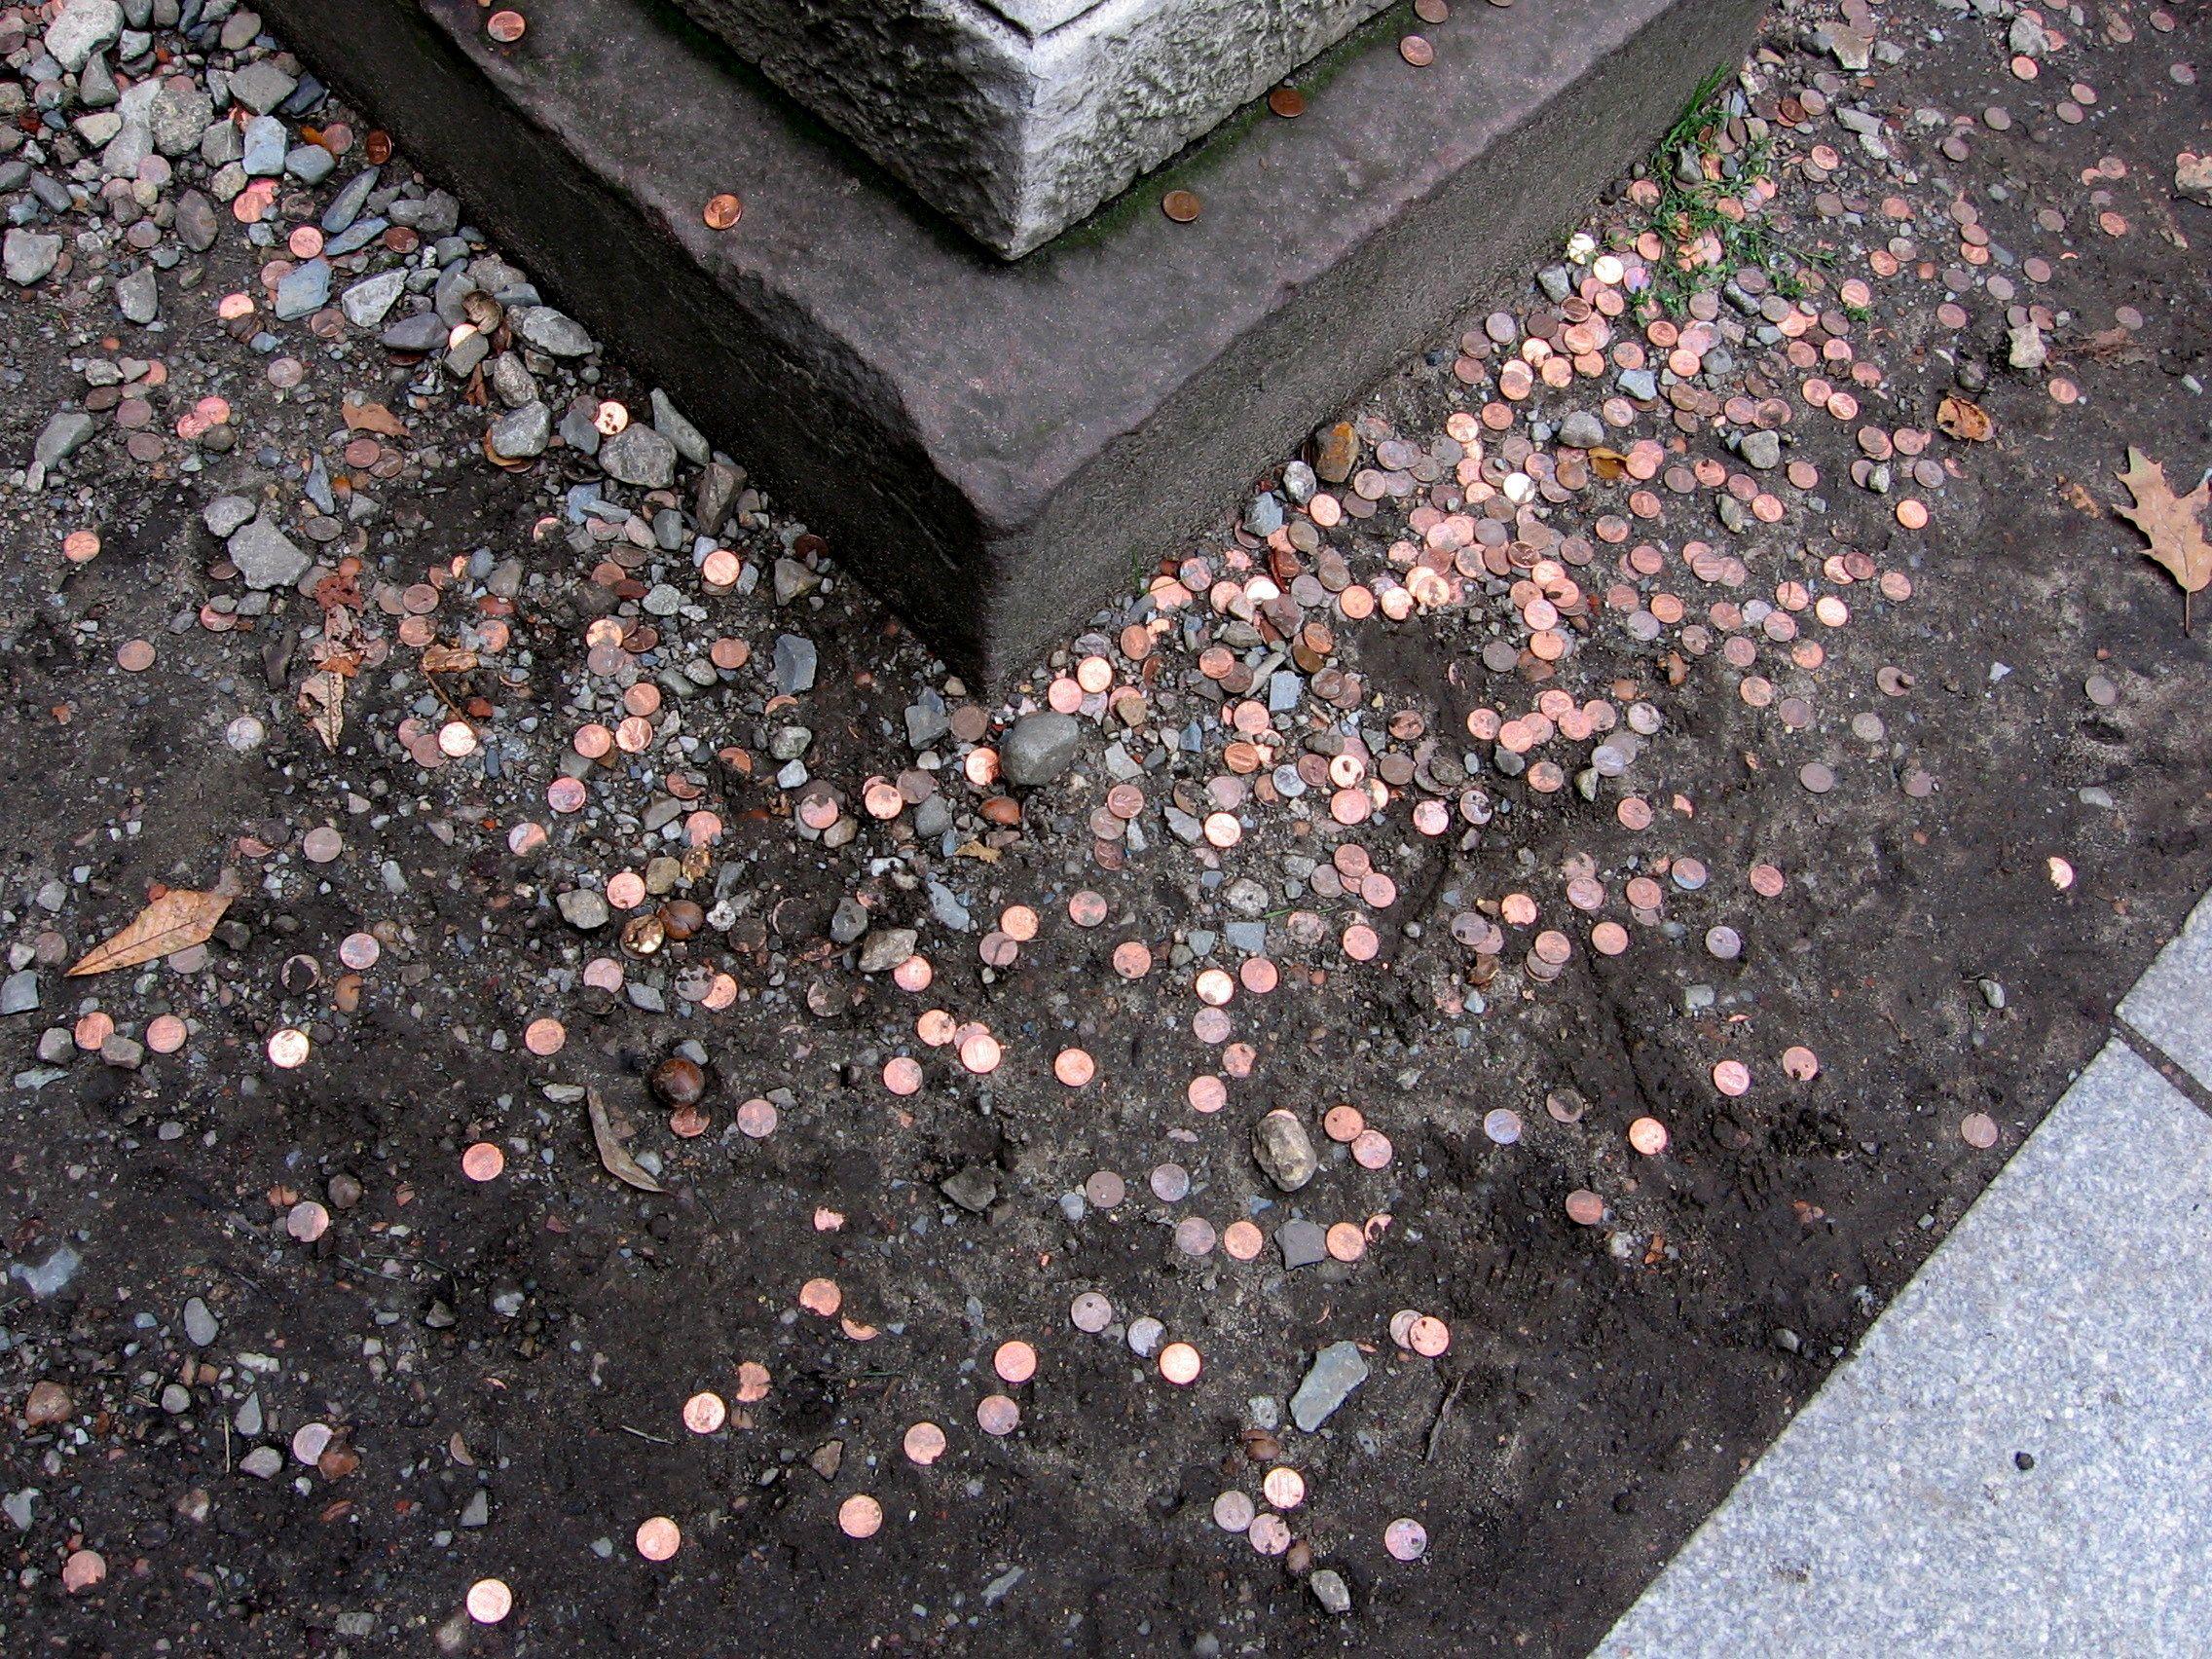 2010-10-10 Boston, Mass   Pennies on the graves.